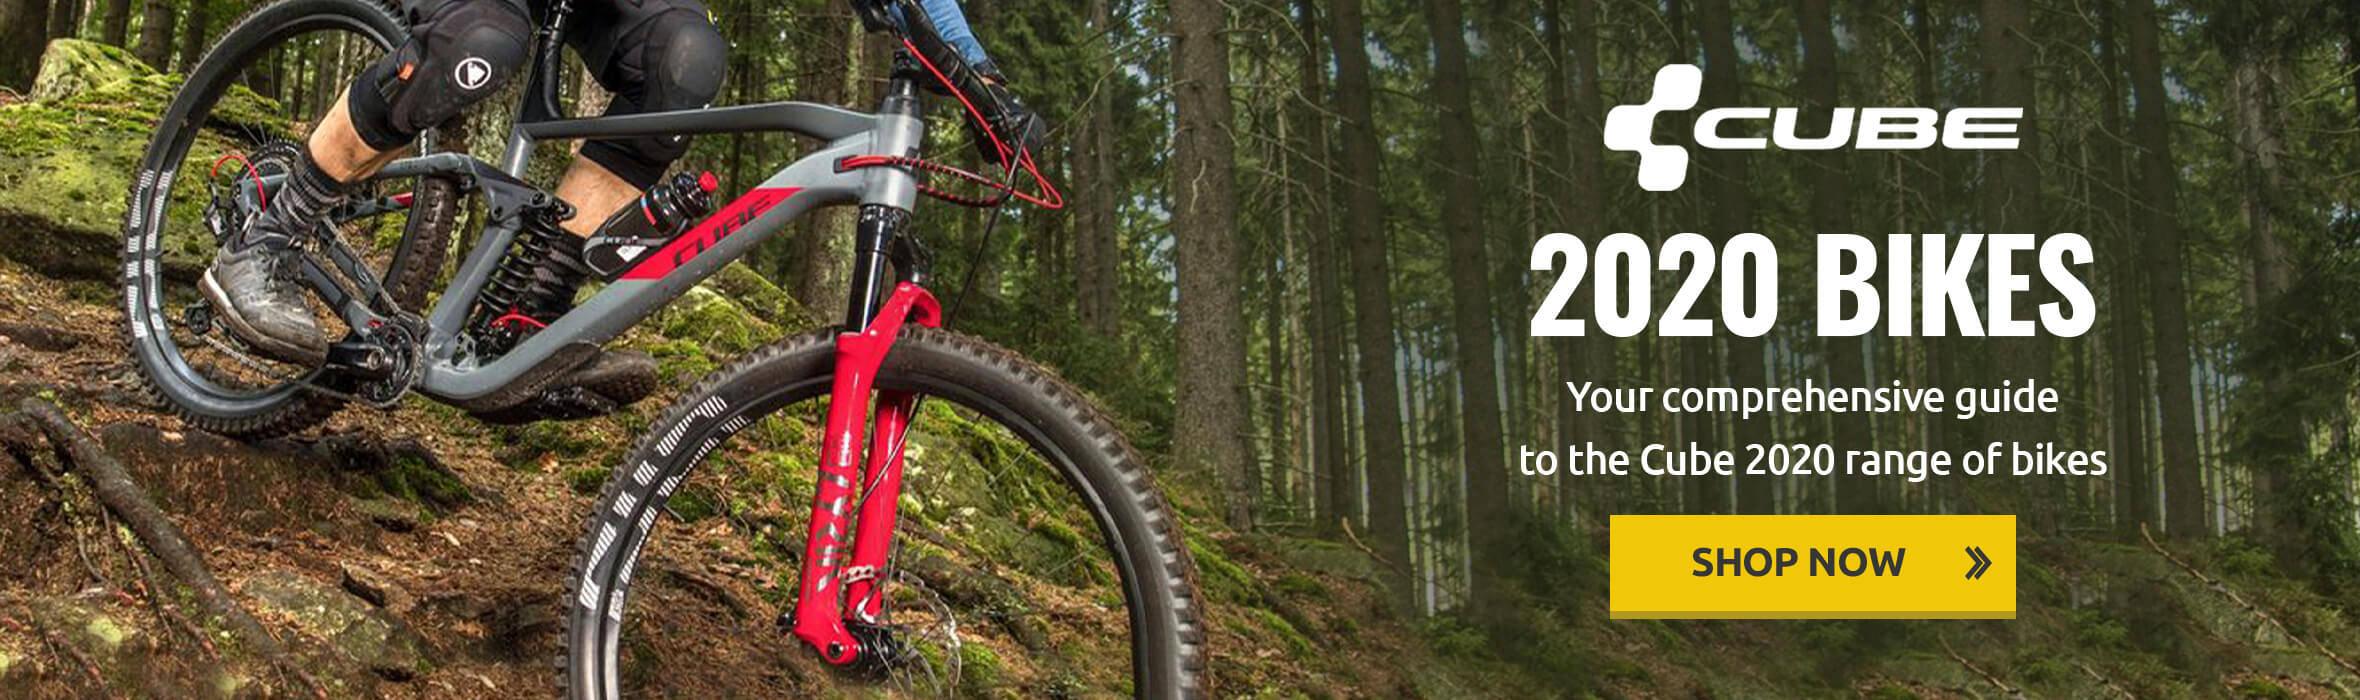 Cube 2020 Bikes